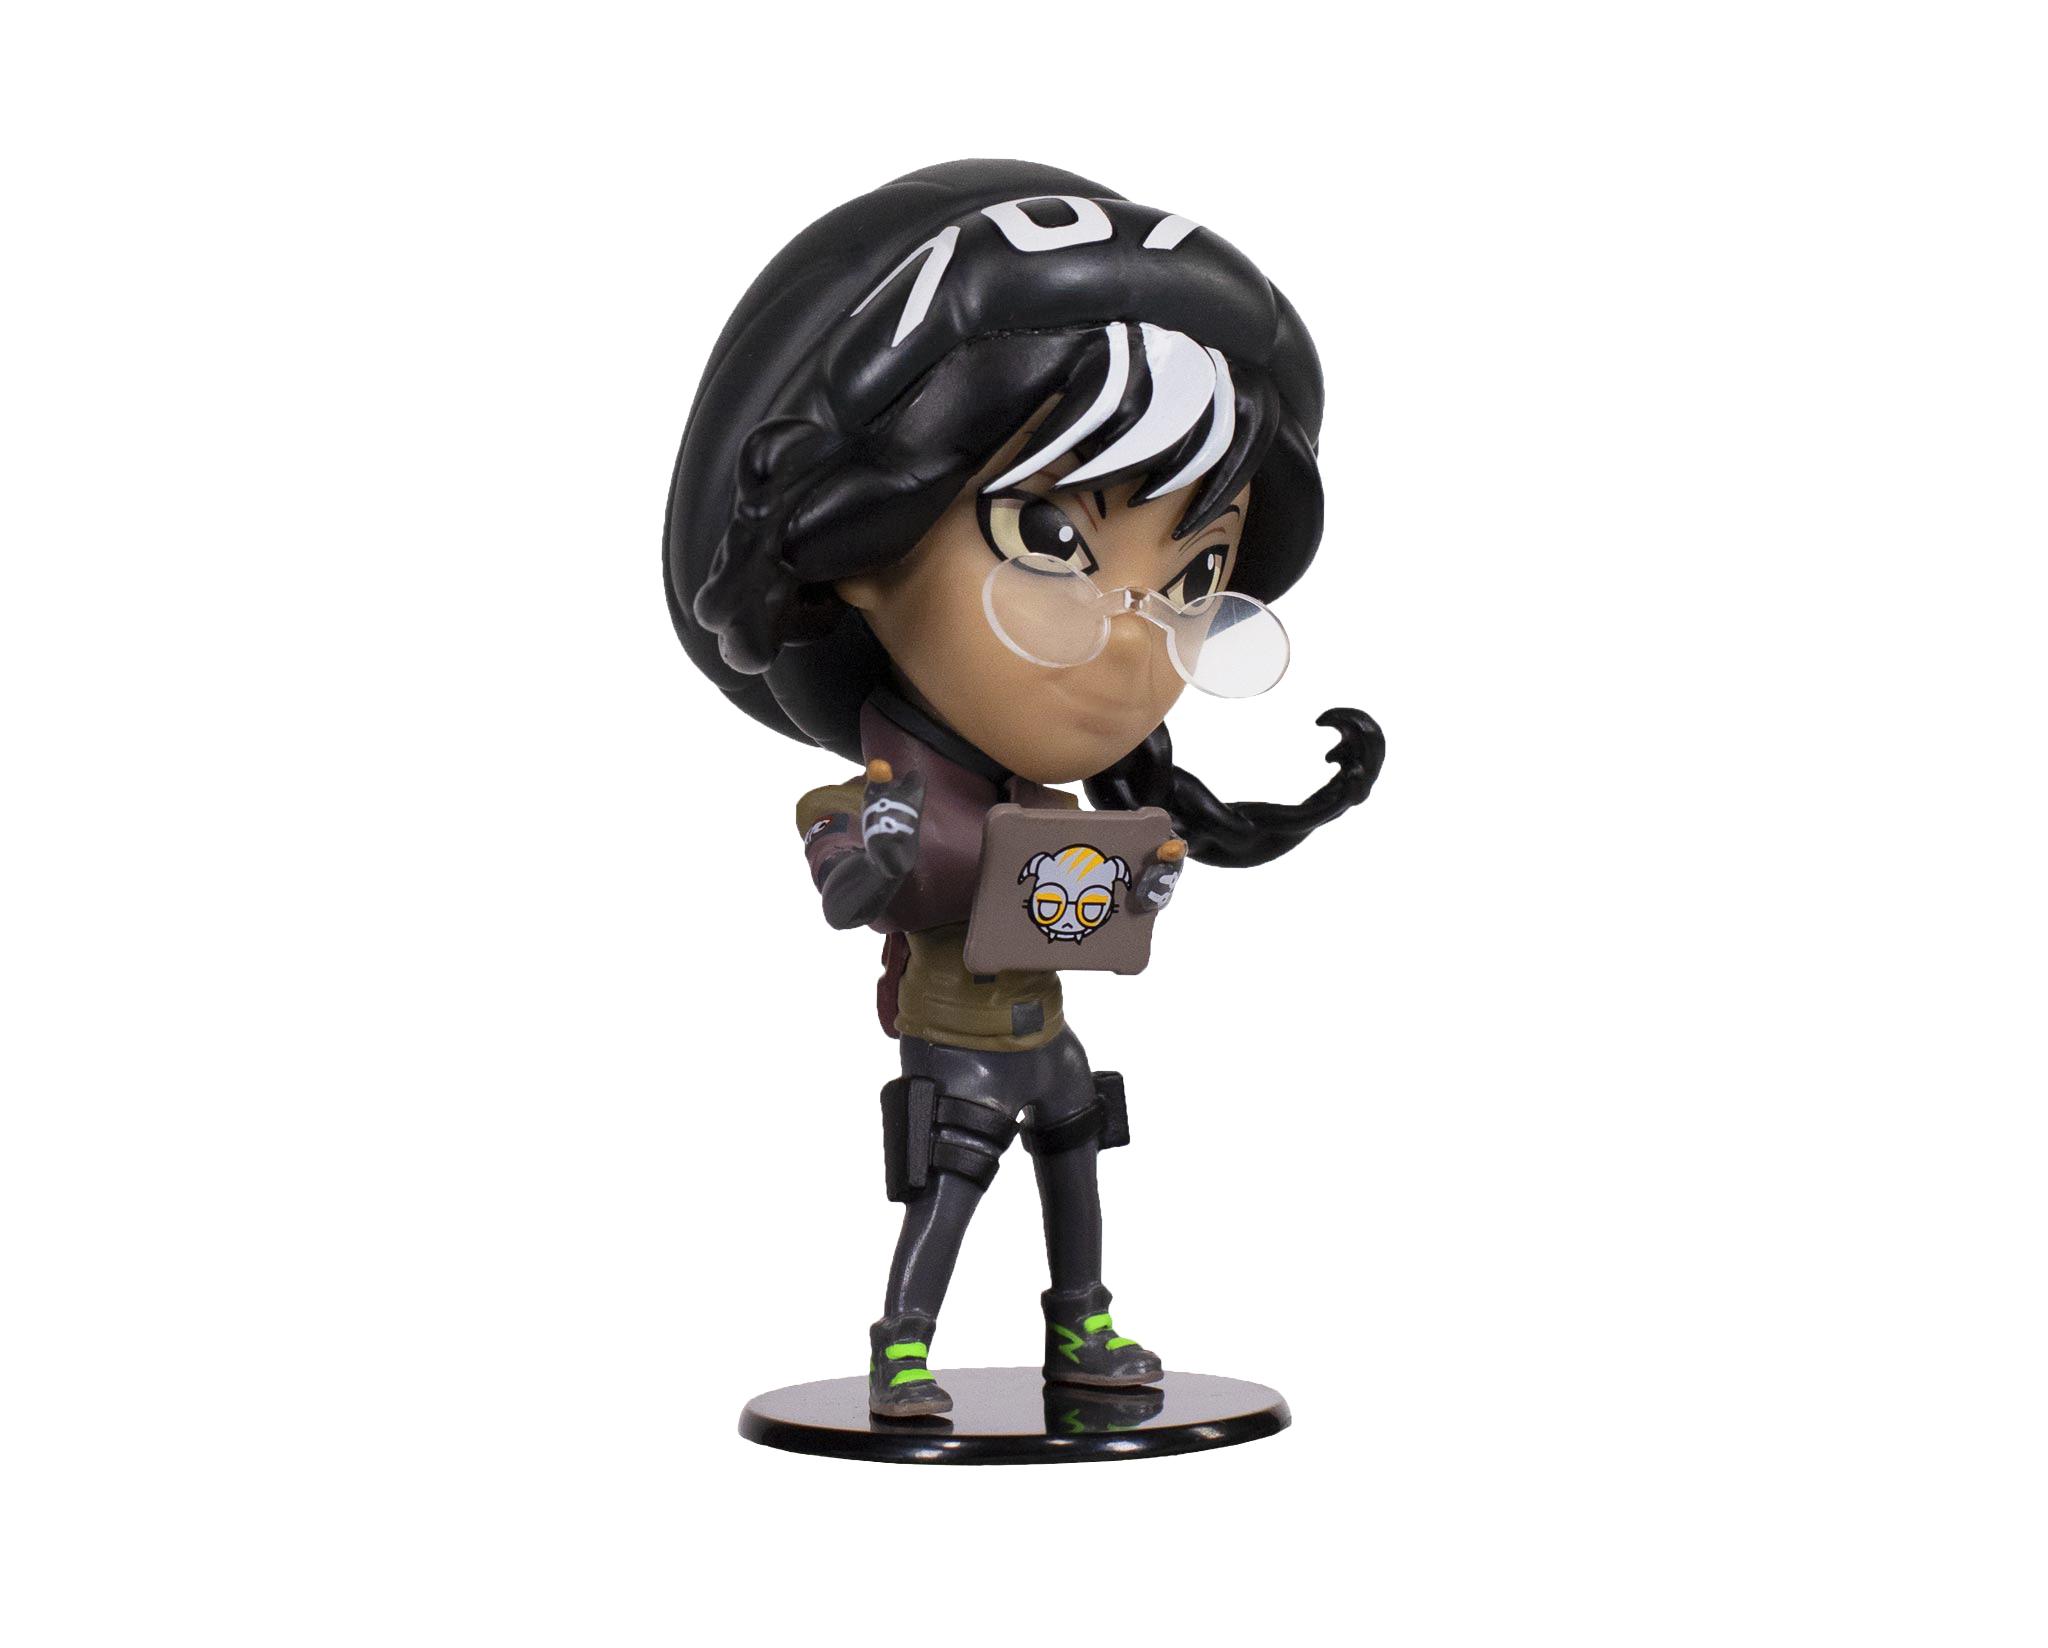 Dokkaebi Chibi Figurine Six Collection Ubisoft Store